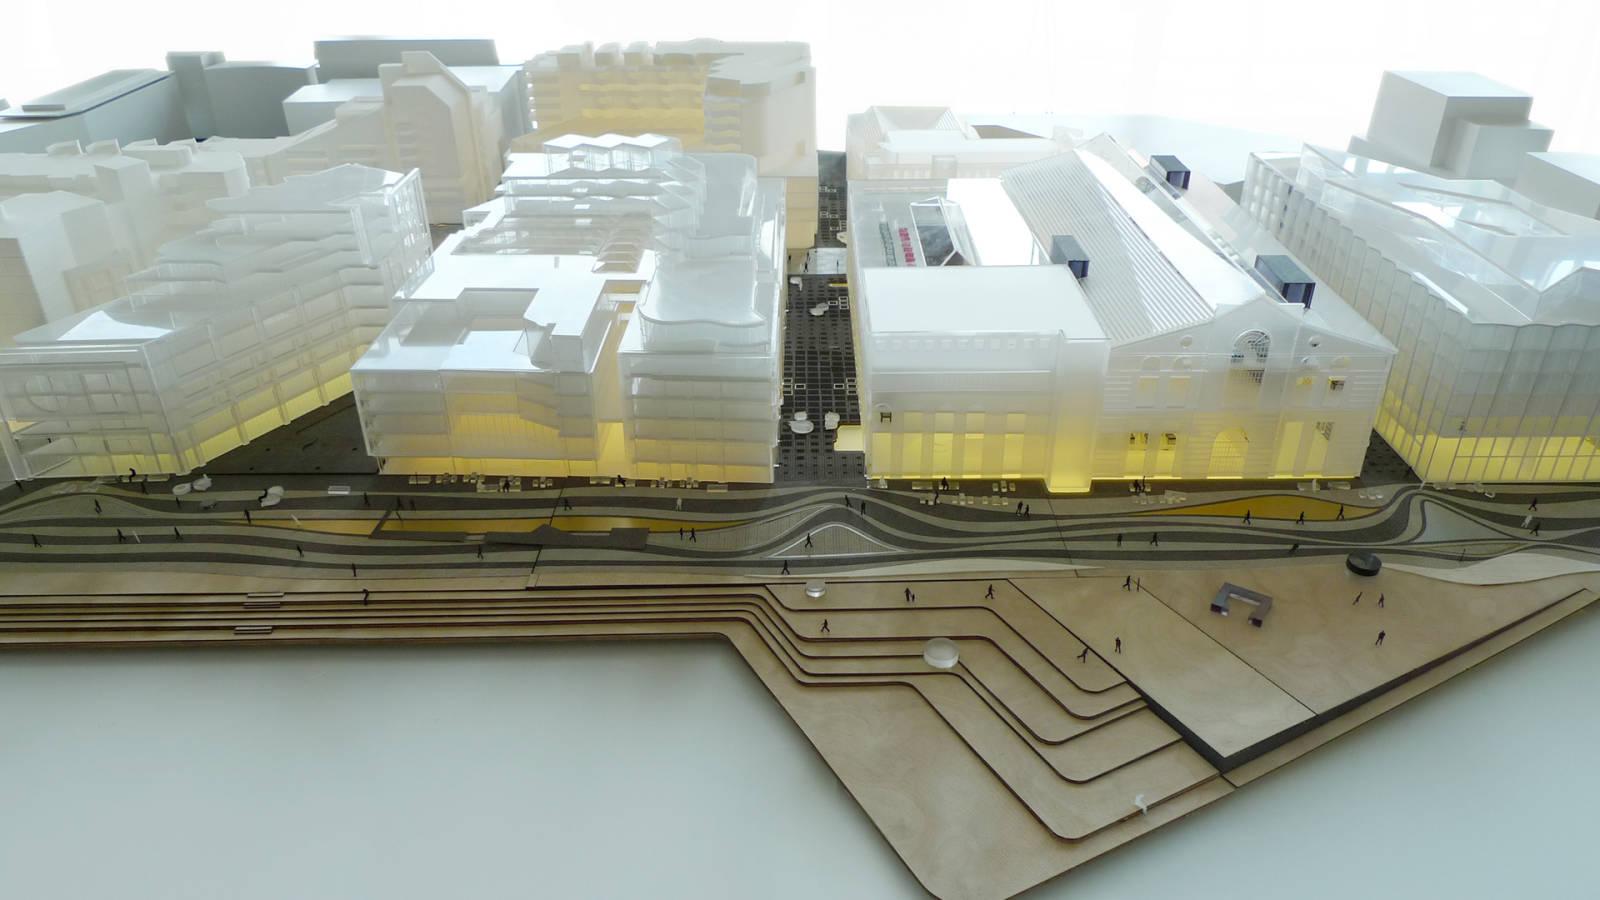 BOARDWALK - Aker Brygge Masterplan - SPOL Architects